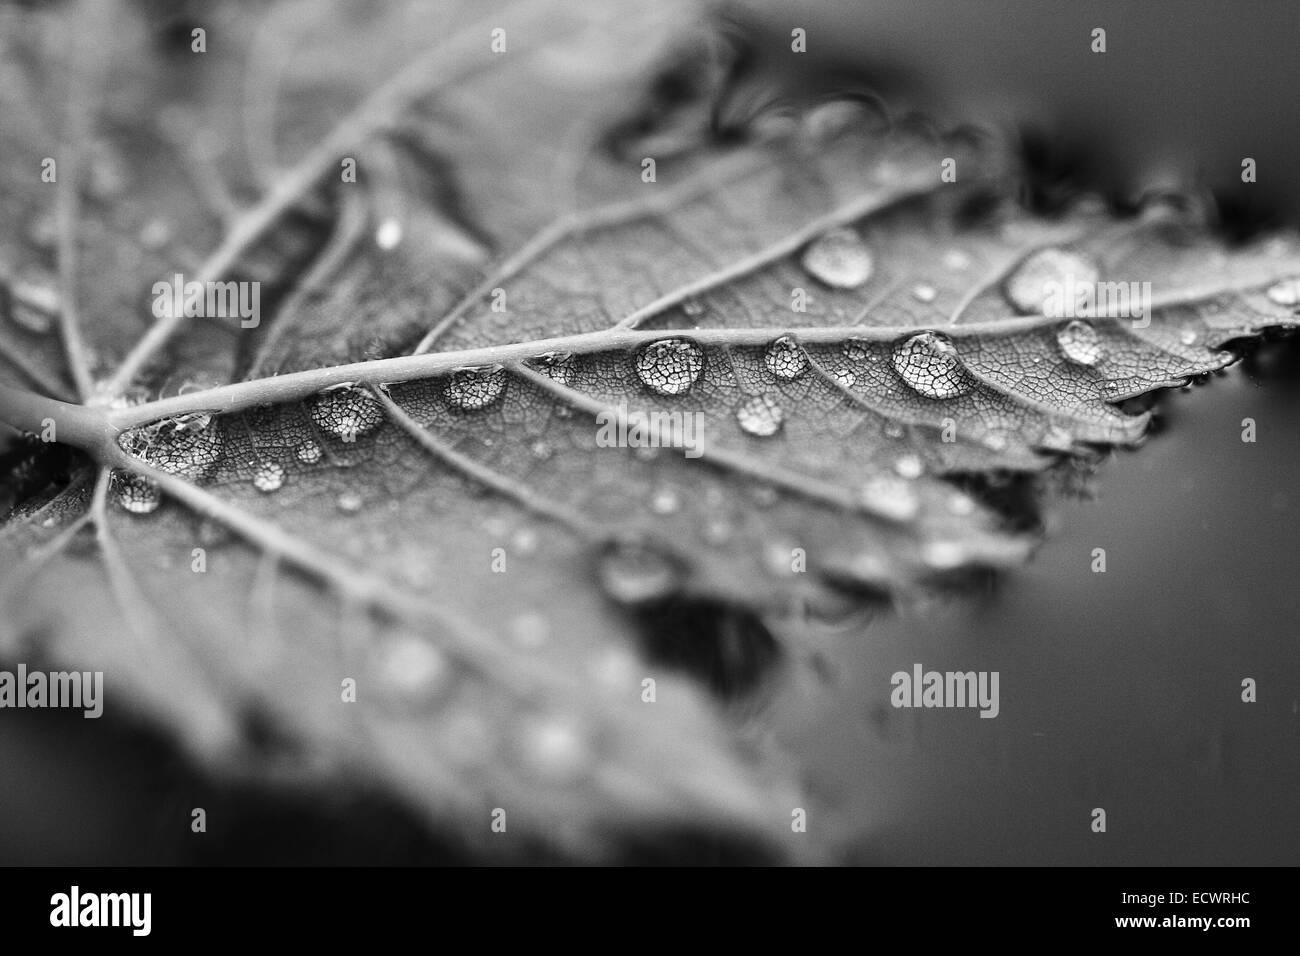 Maple Leaf con gotas de agua flotando sobre el agua Imagen De Stock